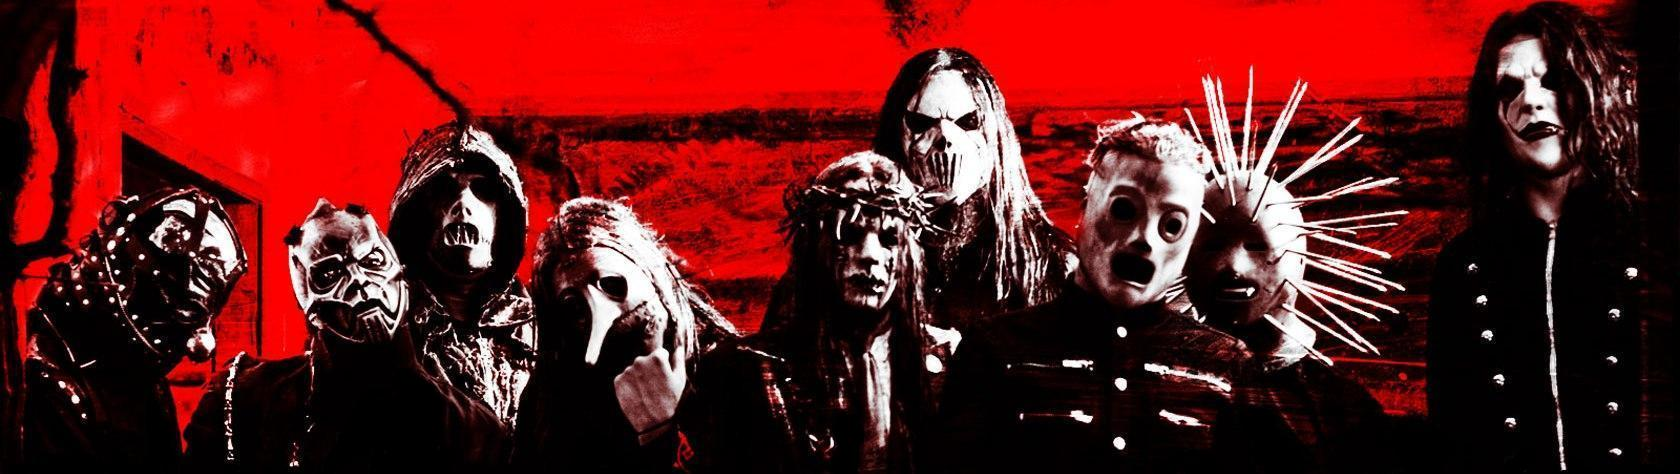 Slipknot - Главная страница: http://slipknot1.my1.ru/